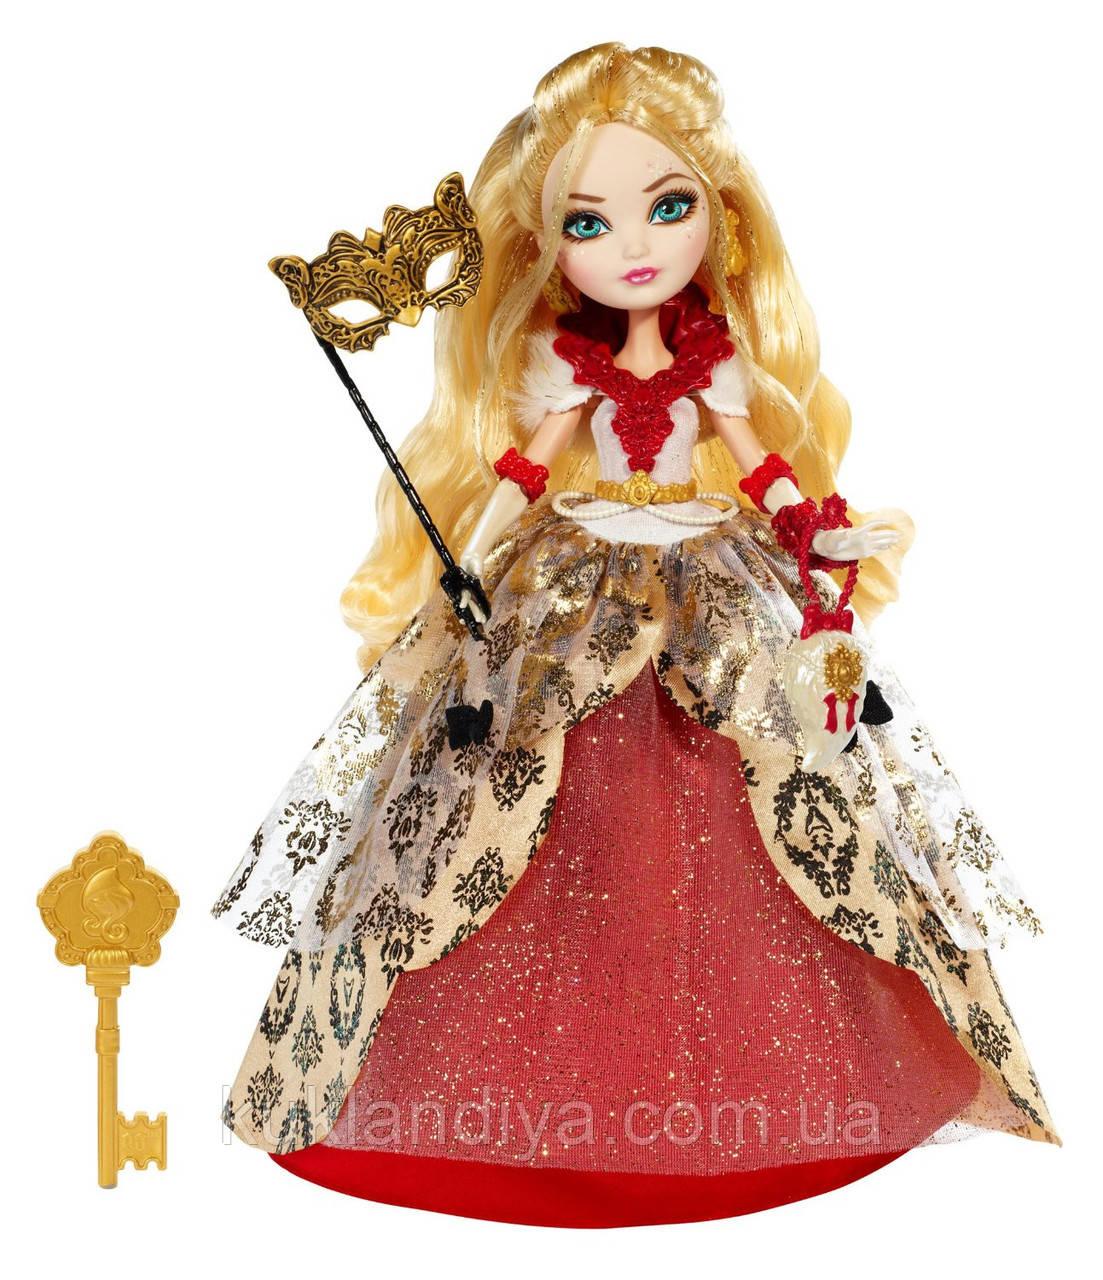 Кукла Эппл Уайт Бал Коронации - Ever After High Apple White Thronecoming Эппл Уайт Бал Коронации